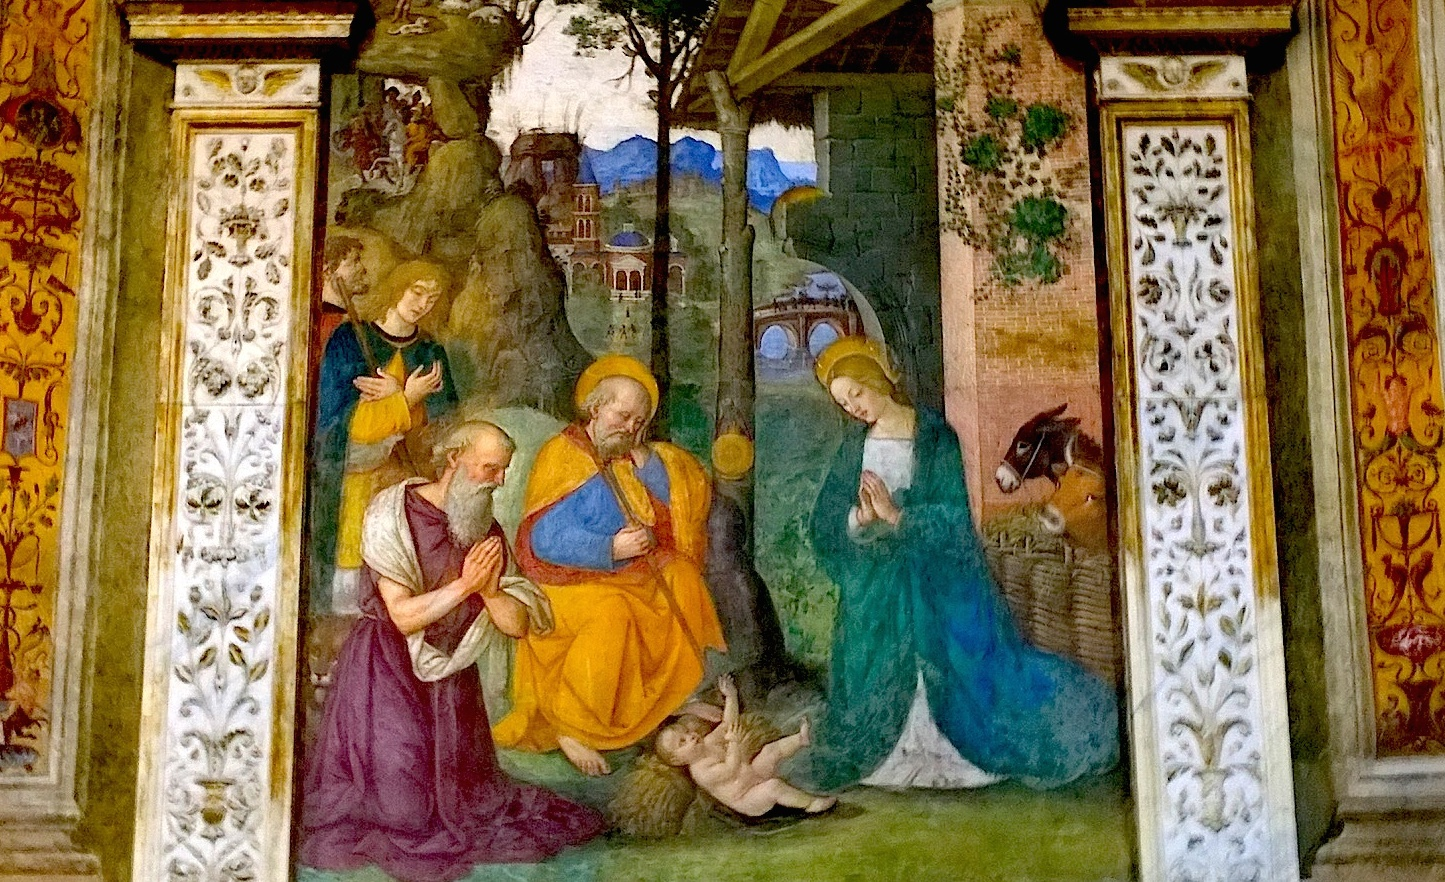 Born Jesus -paint at Cappella Basso Della Rovere: school of Pinturicchioo -  church Santa María del Popolo at Rome